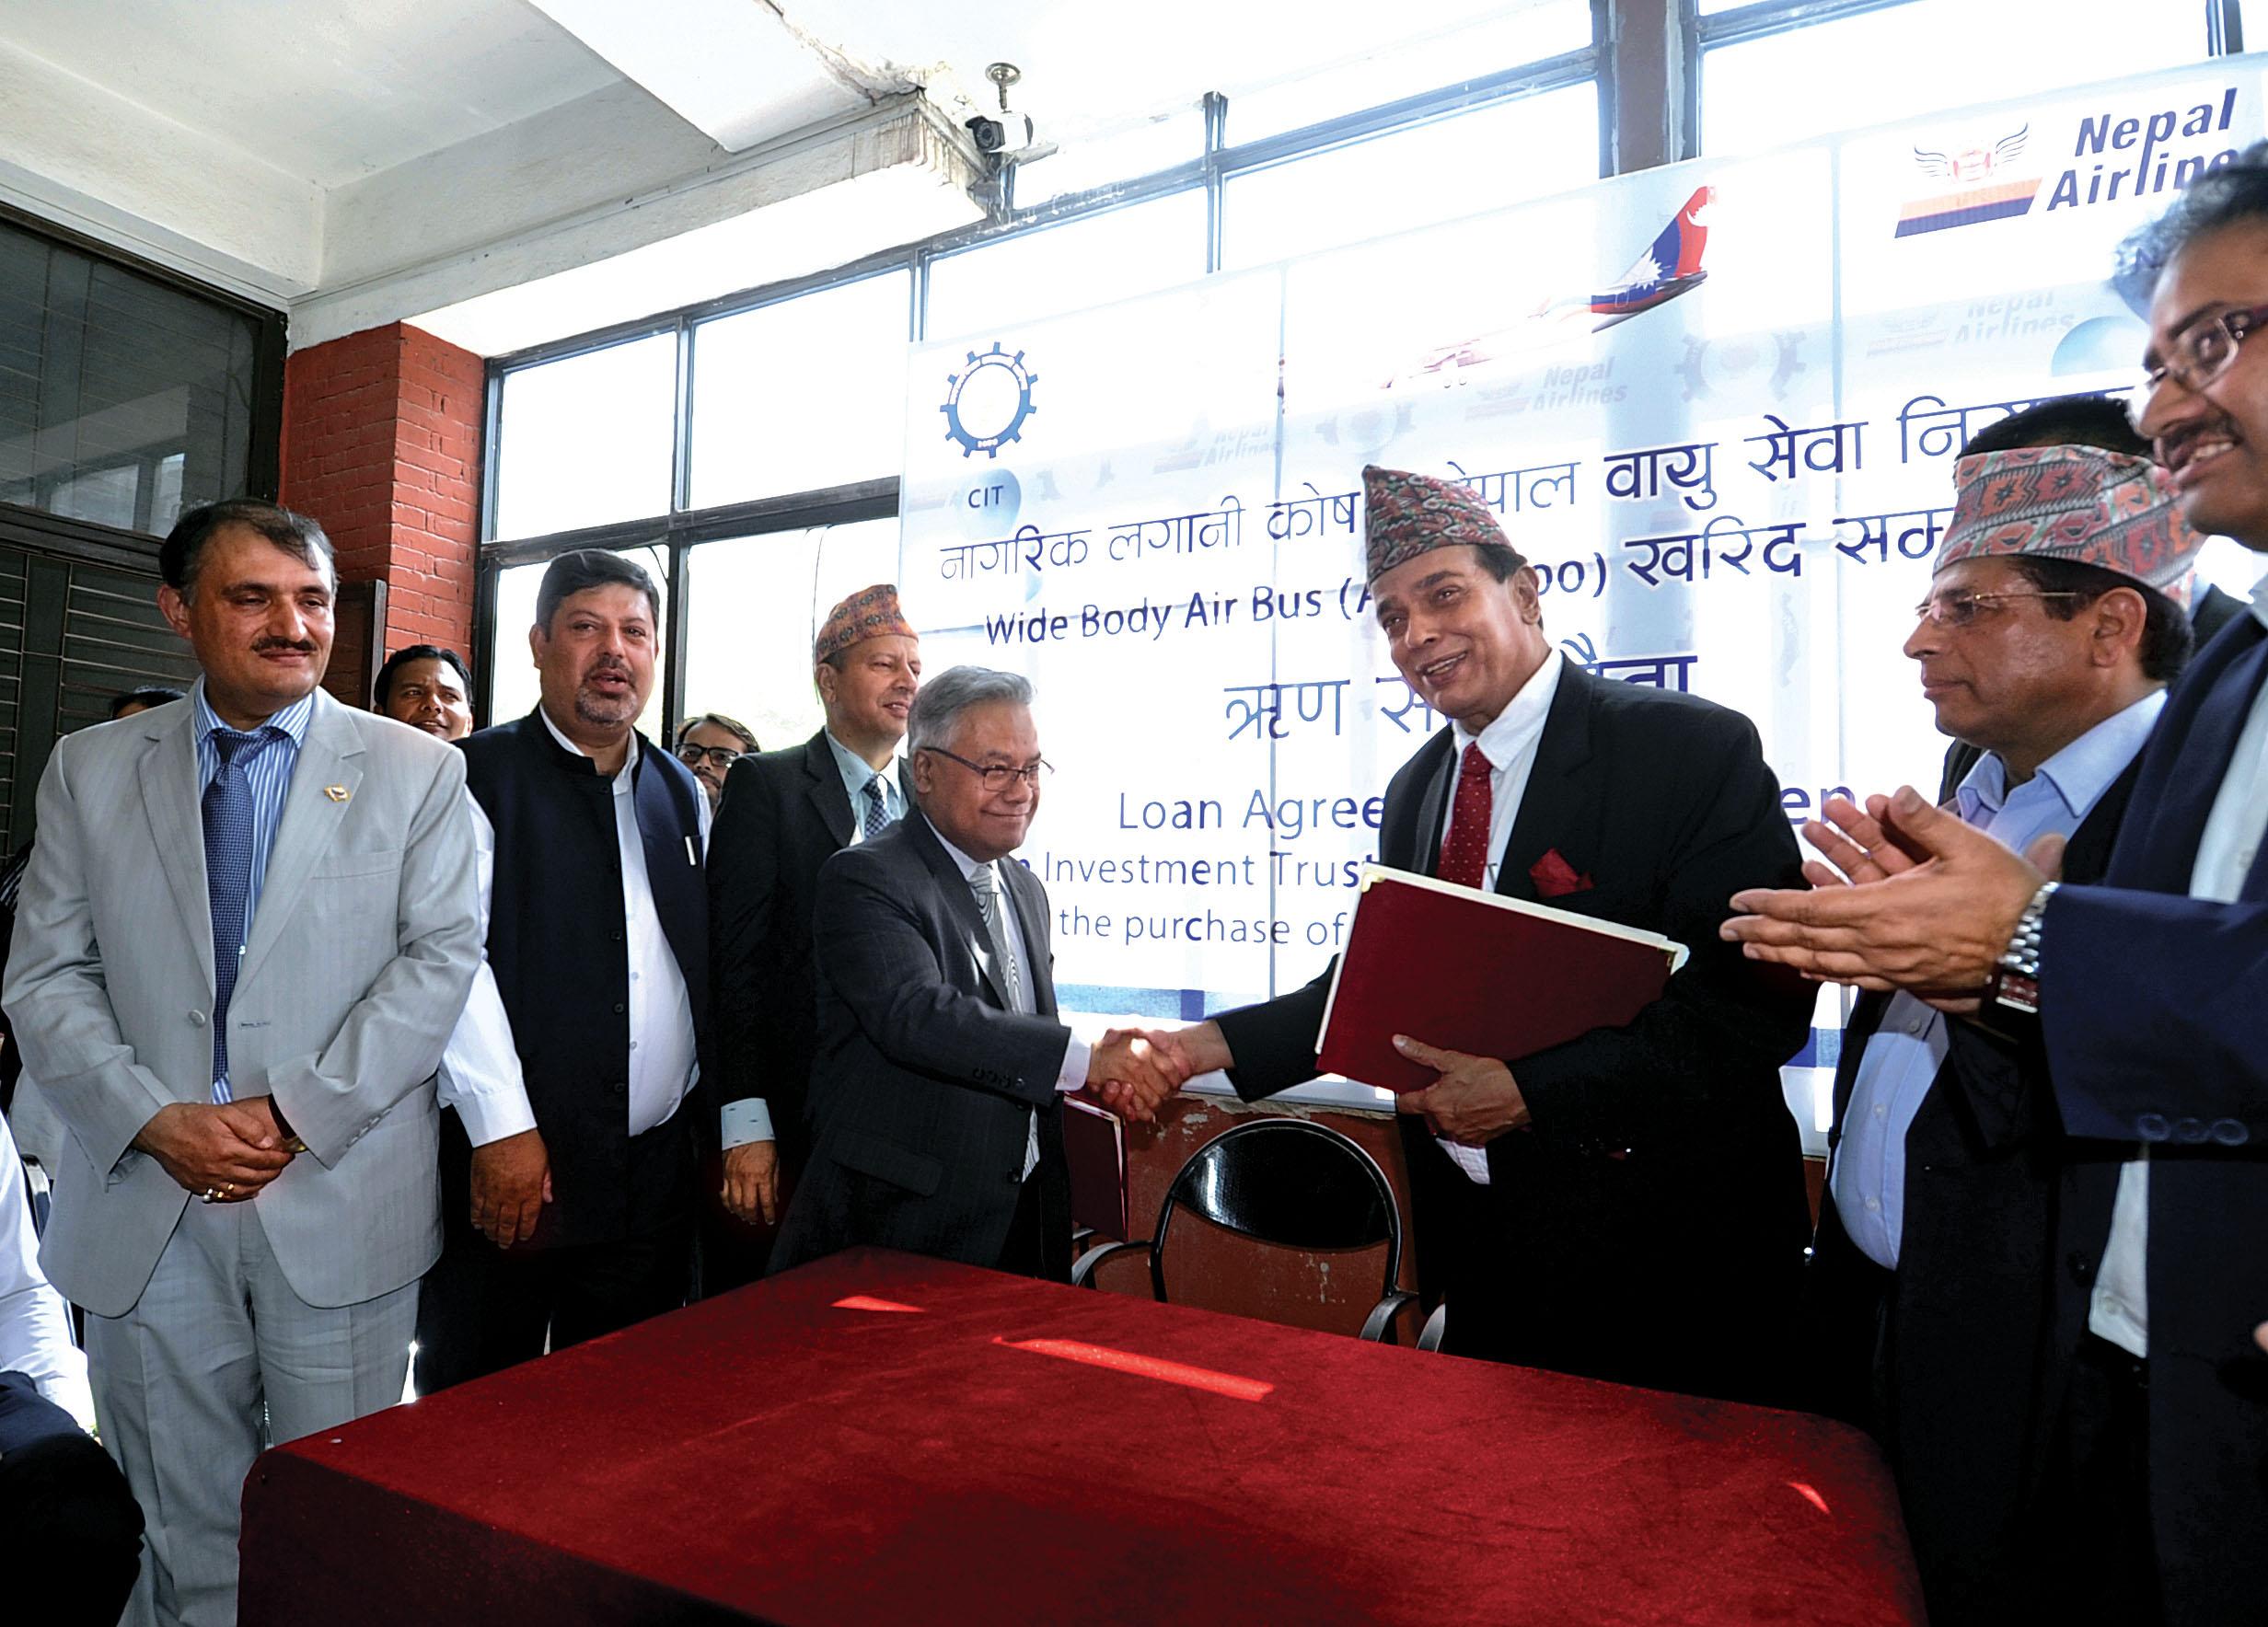 NAC's Managing Director Sugat Ratna Kansakar shaking hands with Executive Director of CIT Ram Krishna Pokharel after signing loan agreement, in Kathmandu, on Monday, June 12, 2017. Photo Courtesy: NAC